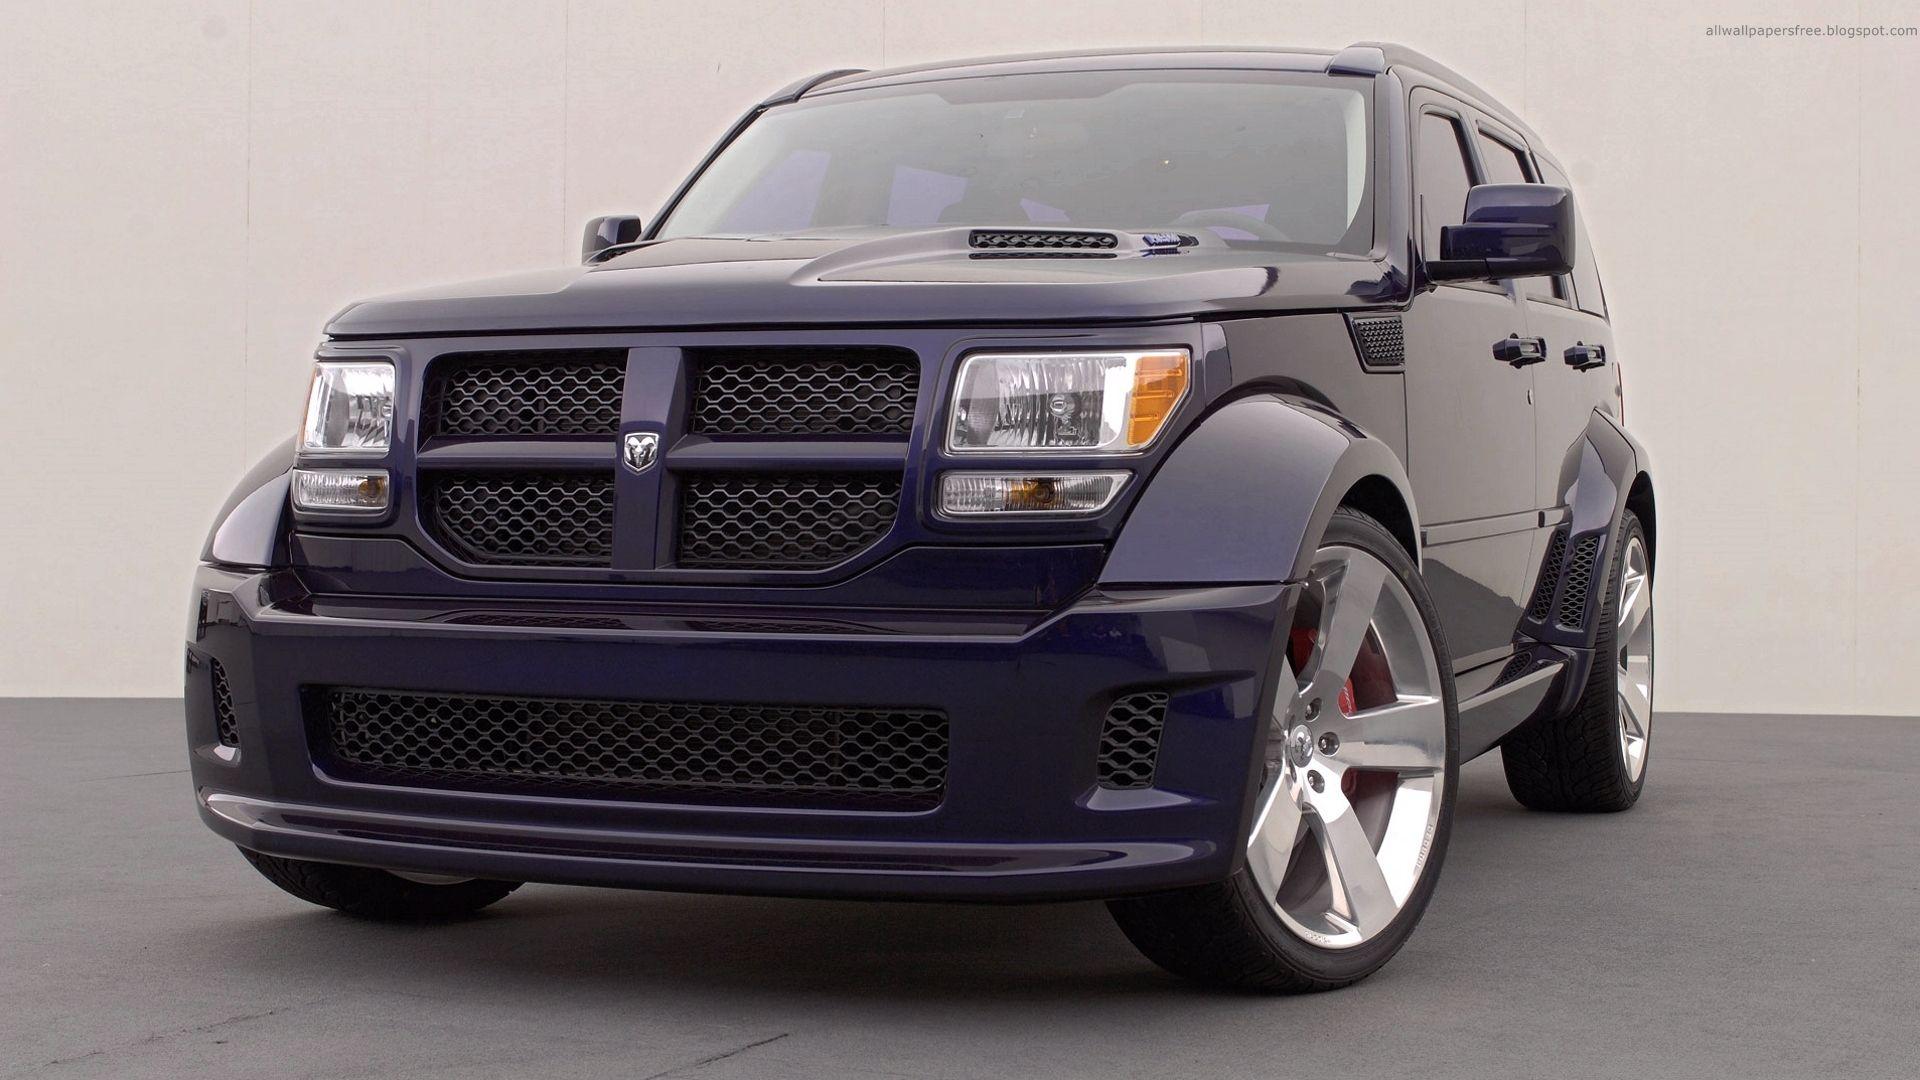 Https Automobilevehiclequotes Blogspot Com Click Here For More Dodge Nitro Dodge Suv Dodge